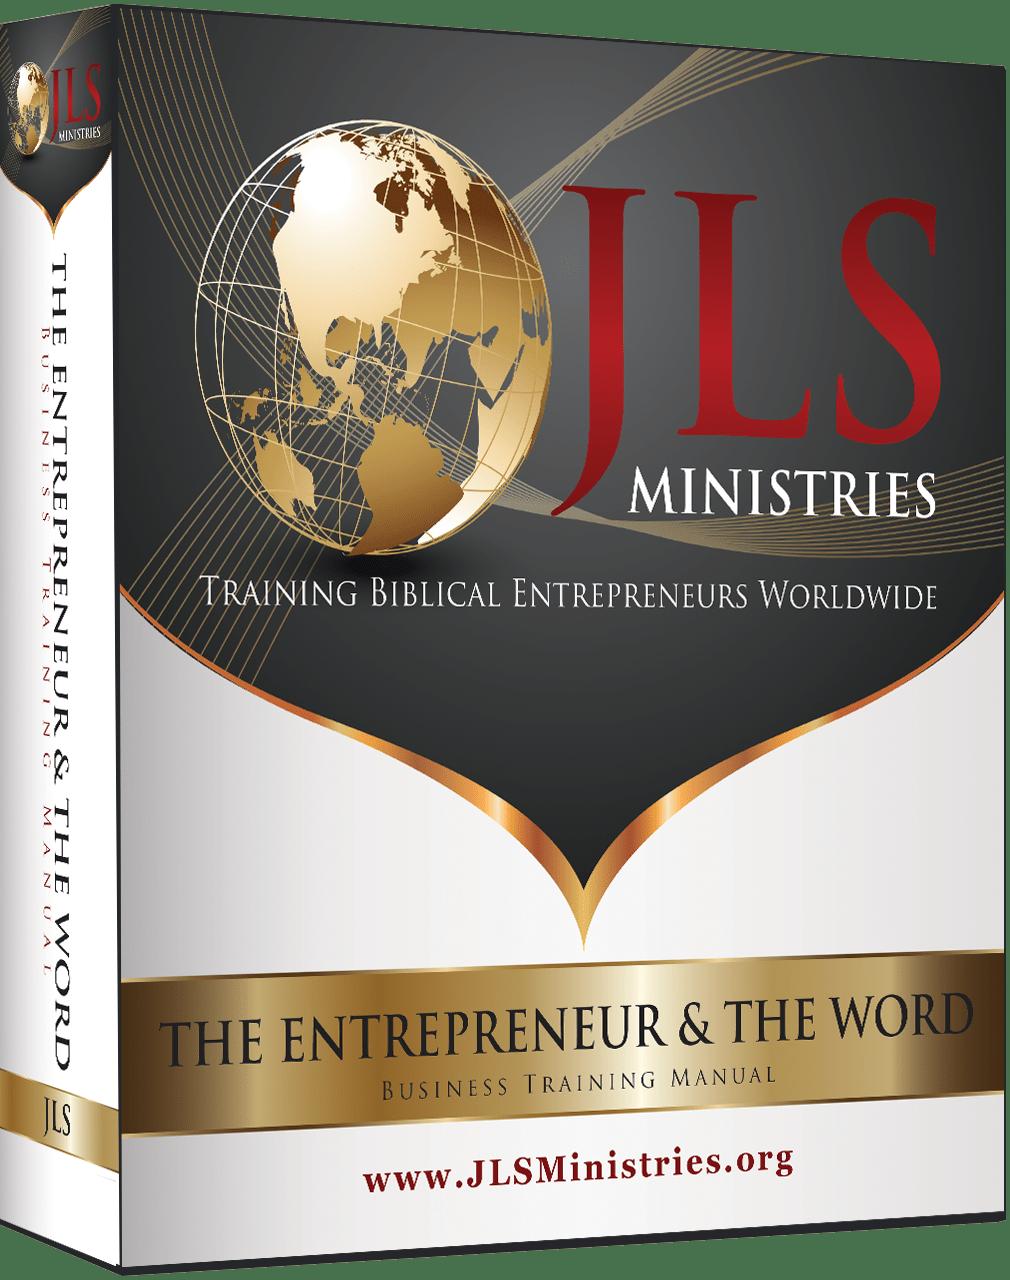 tm-jls0101_business-training-manual